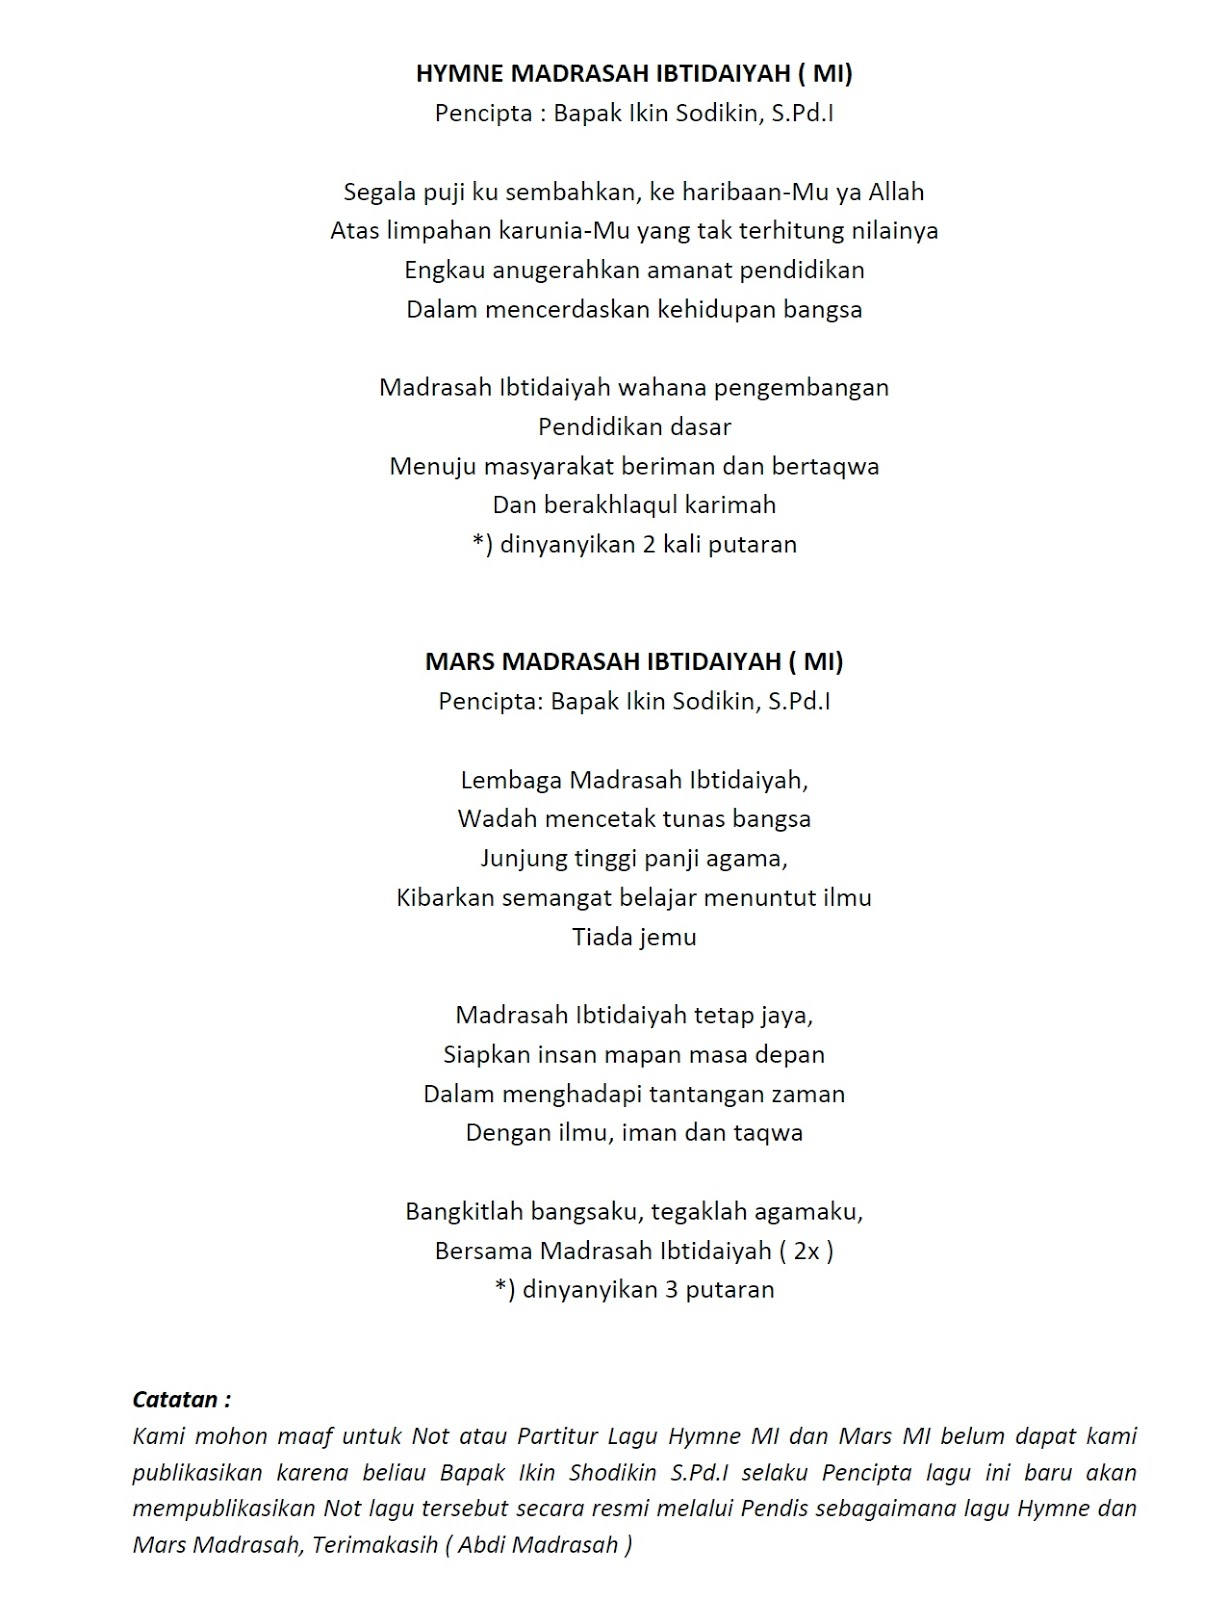 Lirik Hymne Madrasah : lirik, hymne, madrasah, HYMNE, Nurul, Islam, Labruk, Kidul, Kec.Sumbersuko, Kab.Lumajang